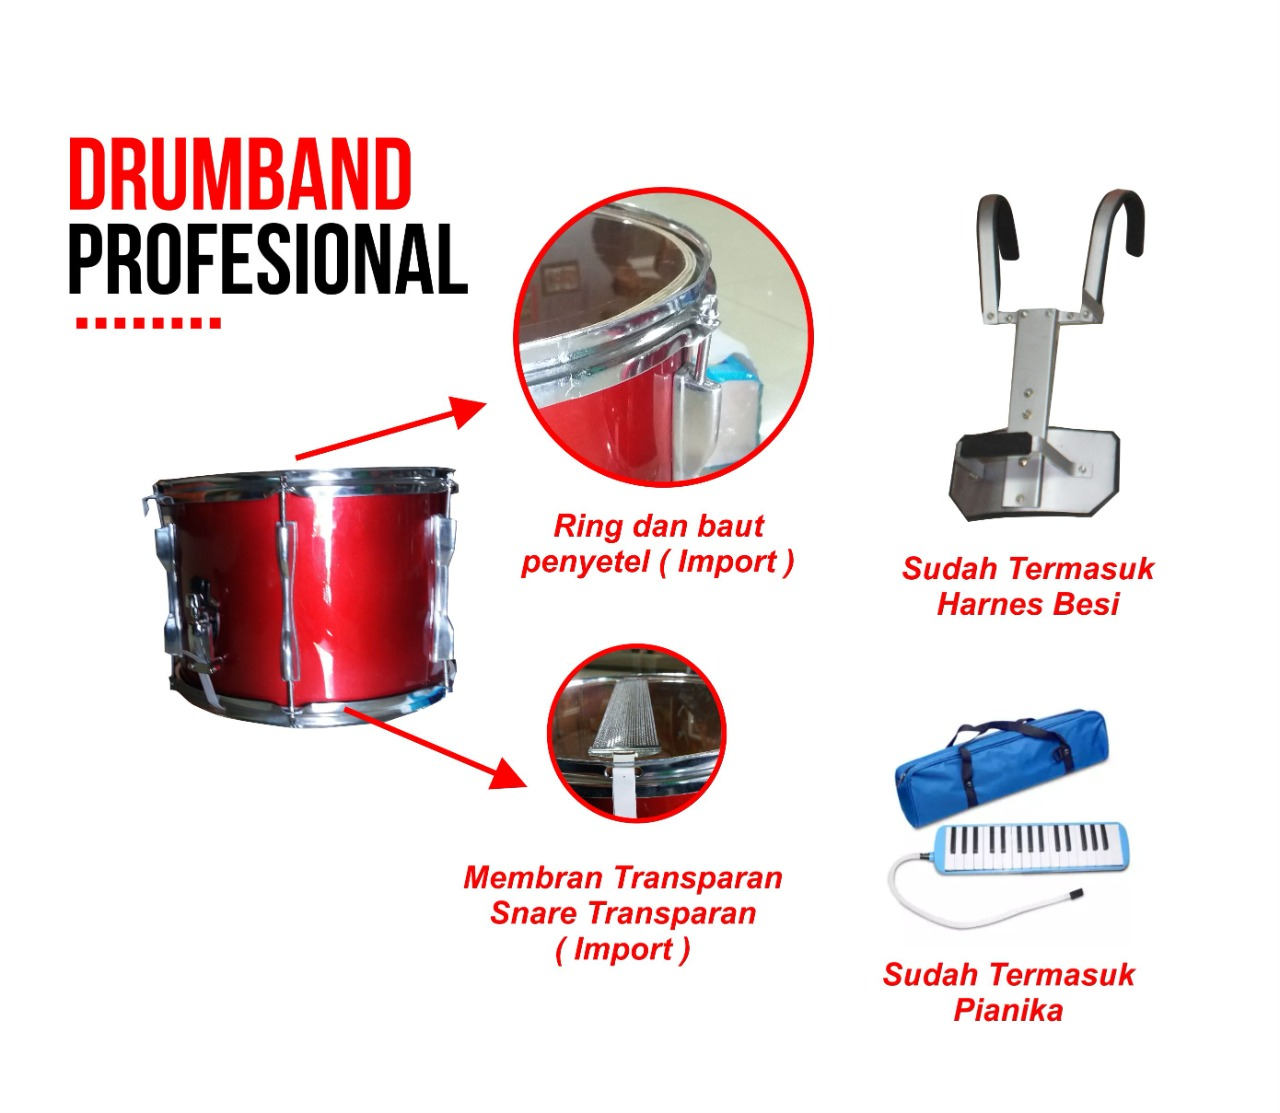 harga drumband profesional